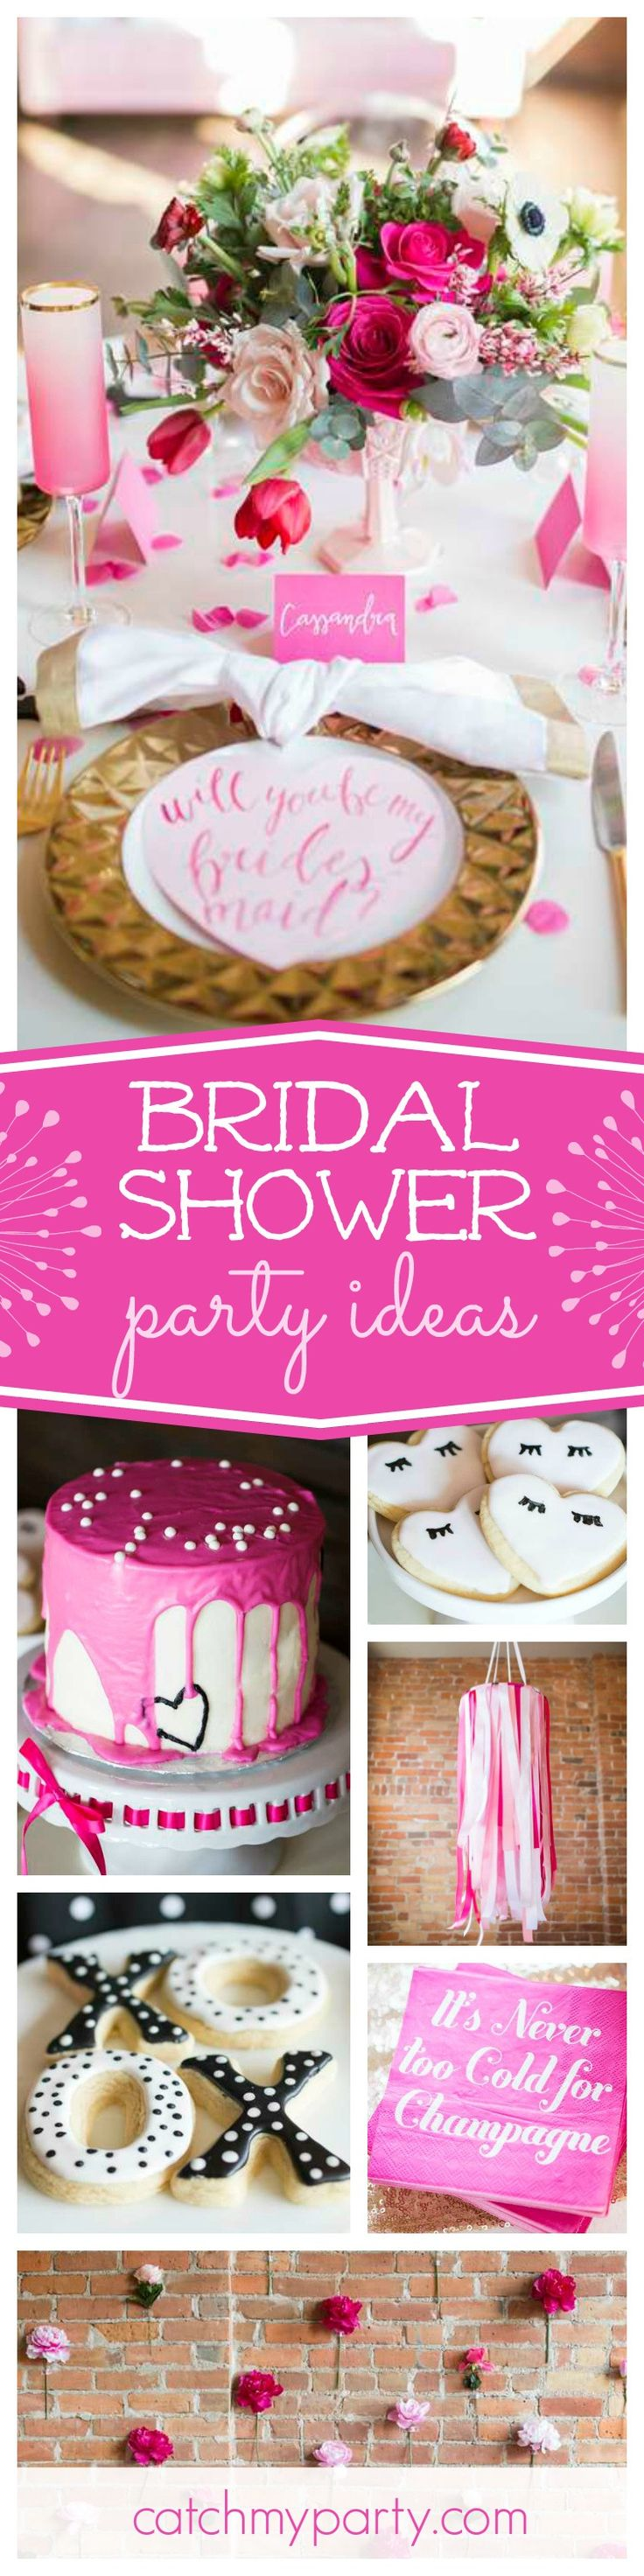 743 best Bridal Shower Ideas images on Pinterest